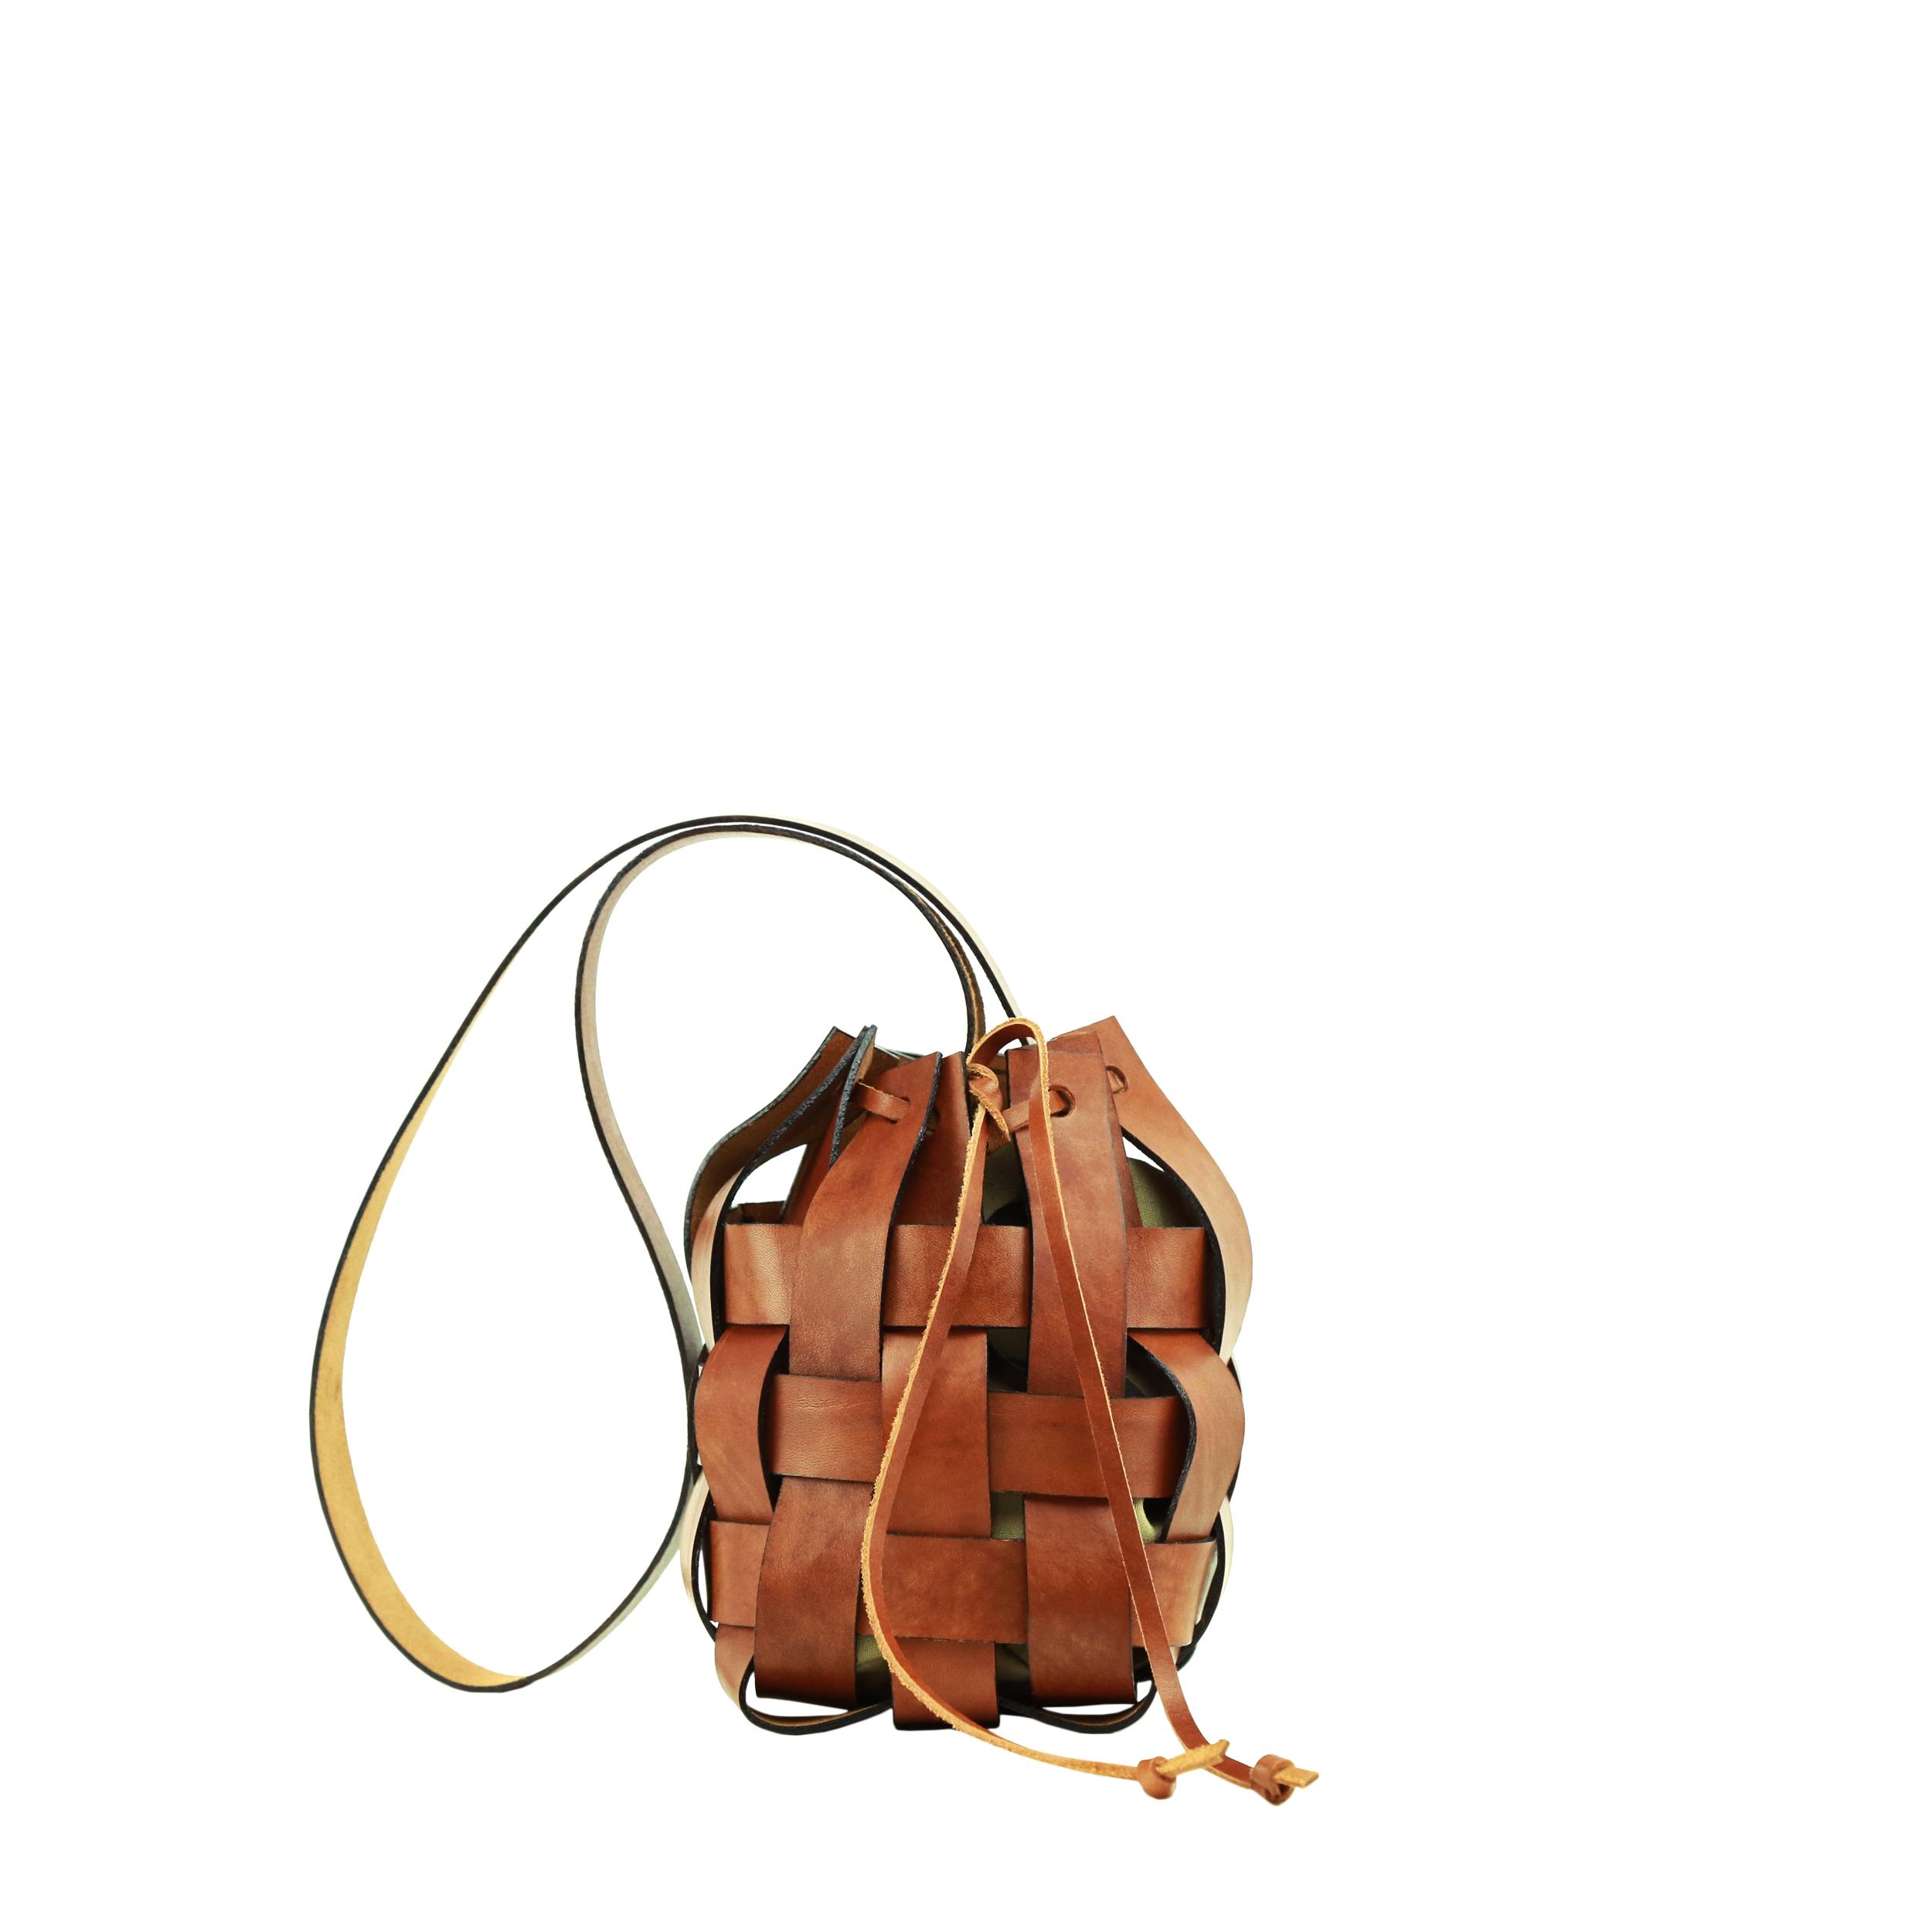 Torba-PANE-Woven-Basket-Bag-Wild-2